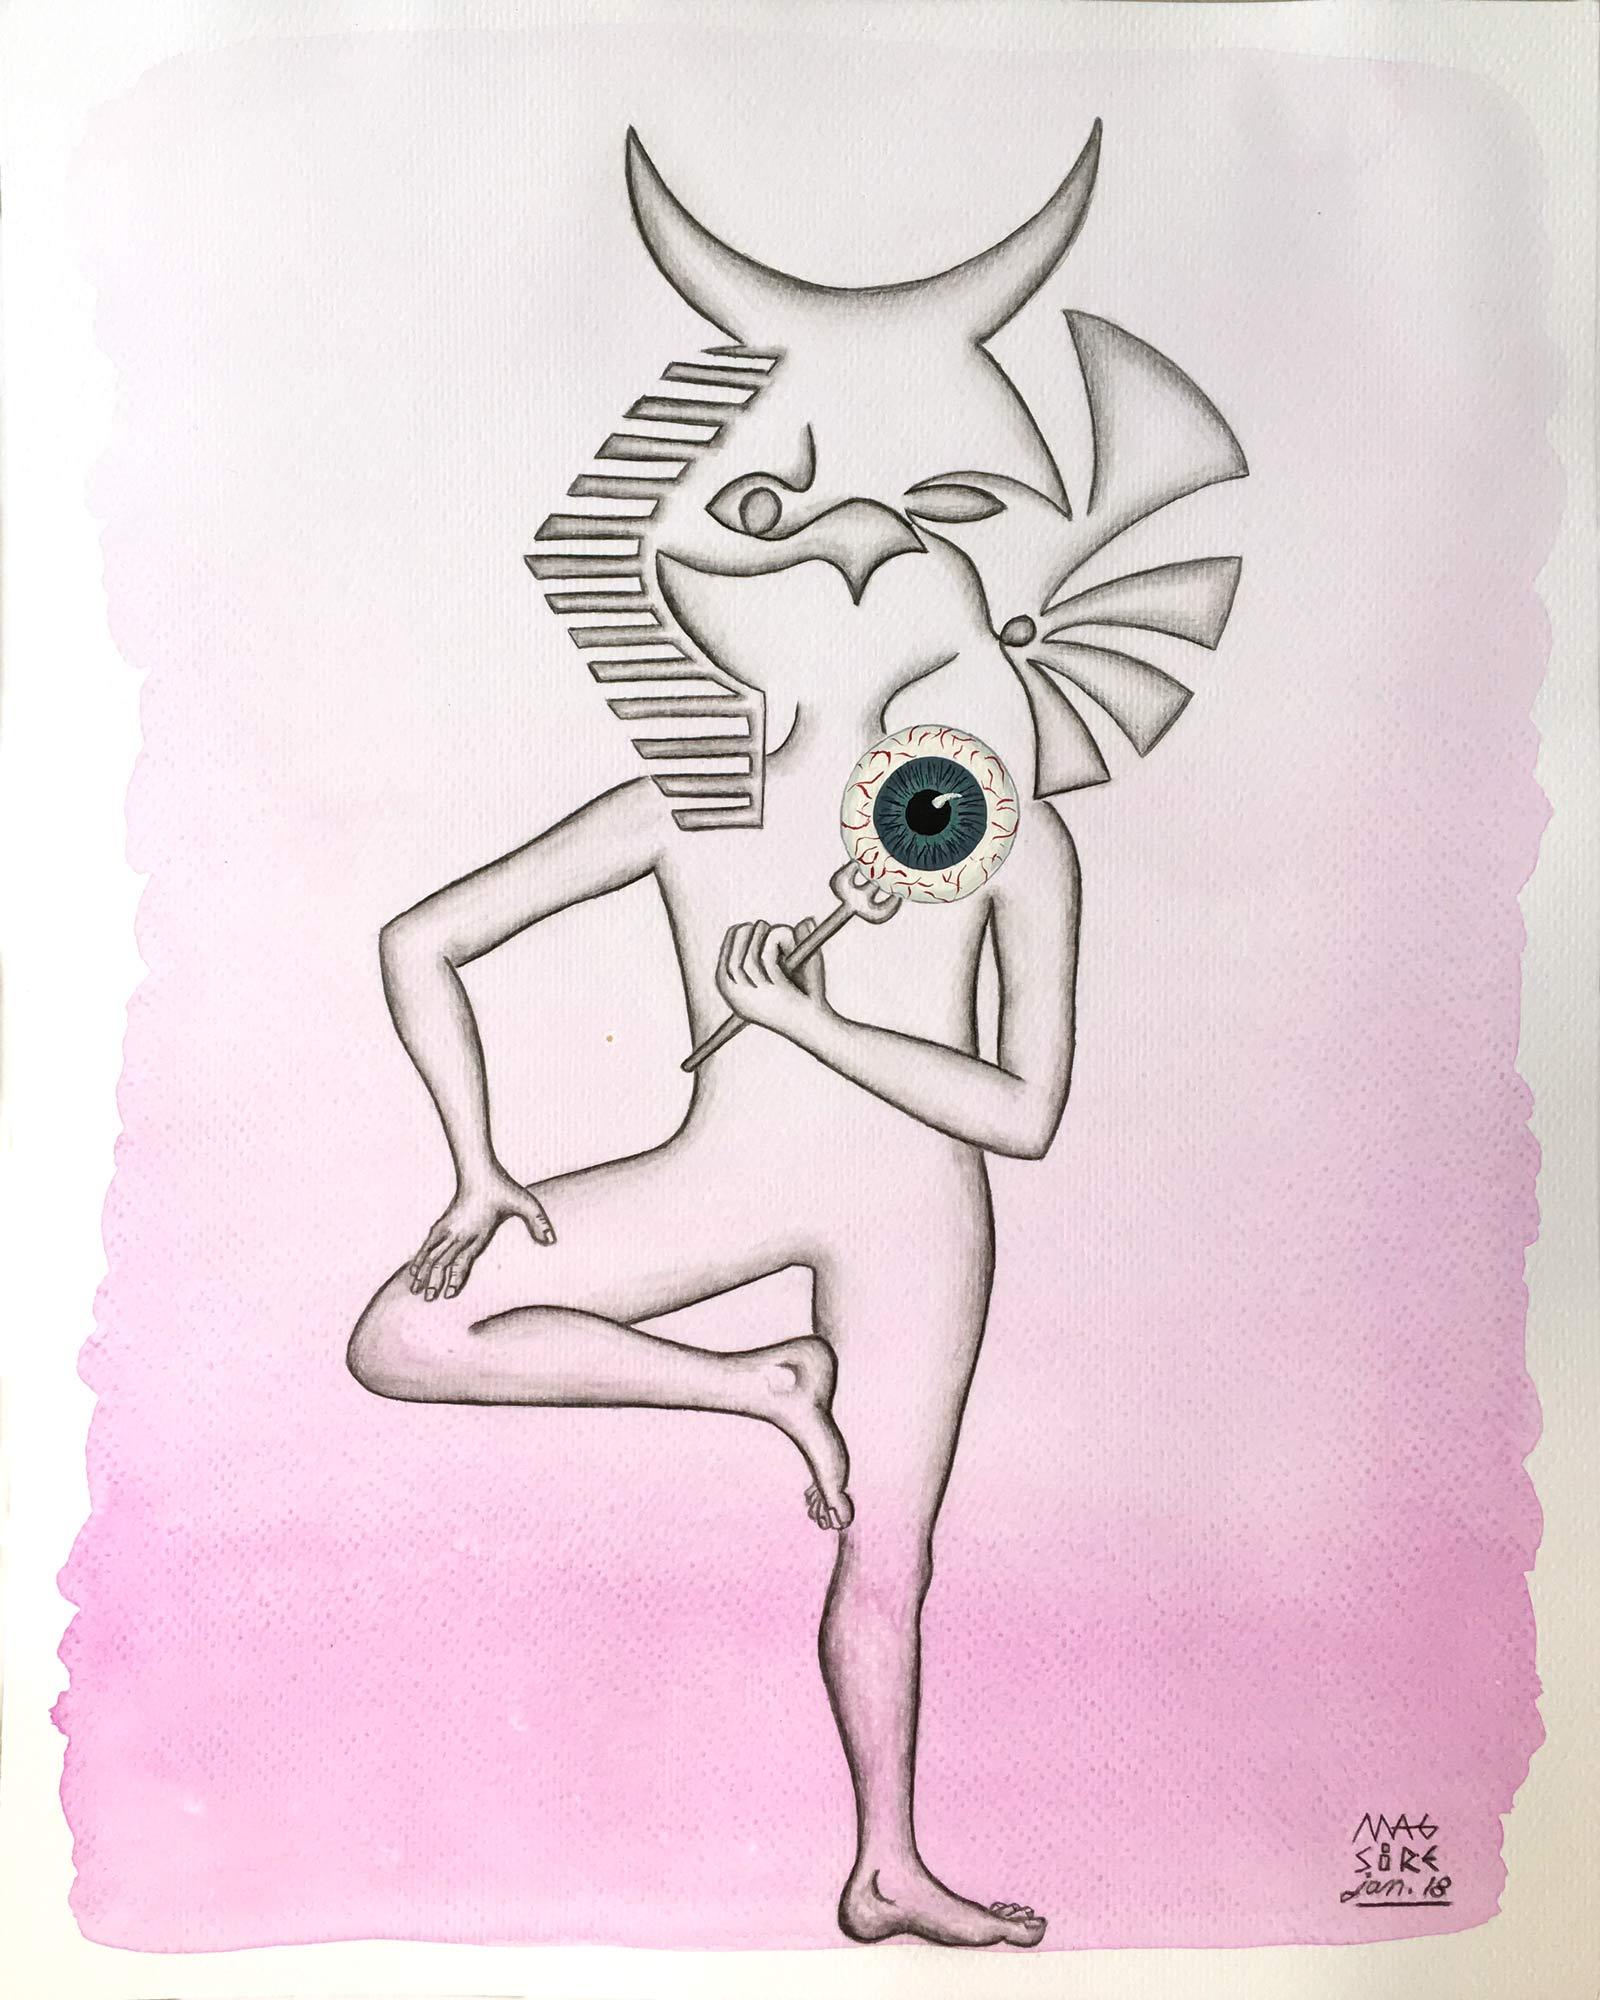 L'oeil d'horus | 30 x 24 cm